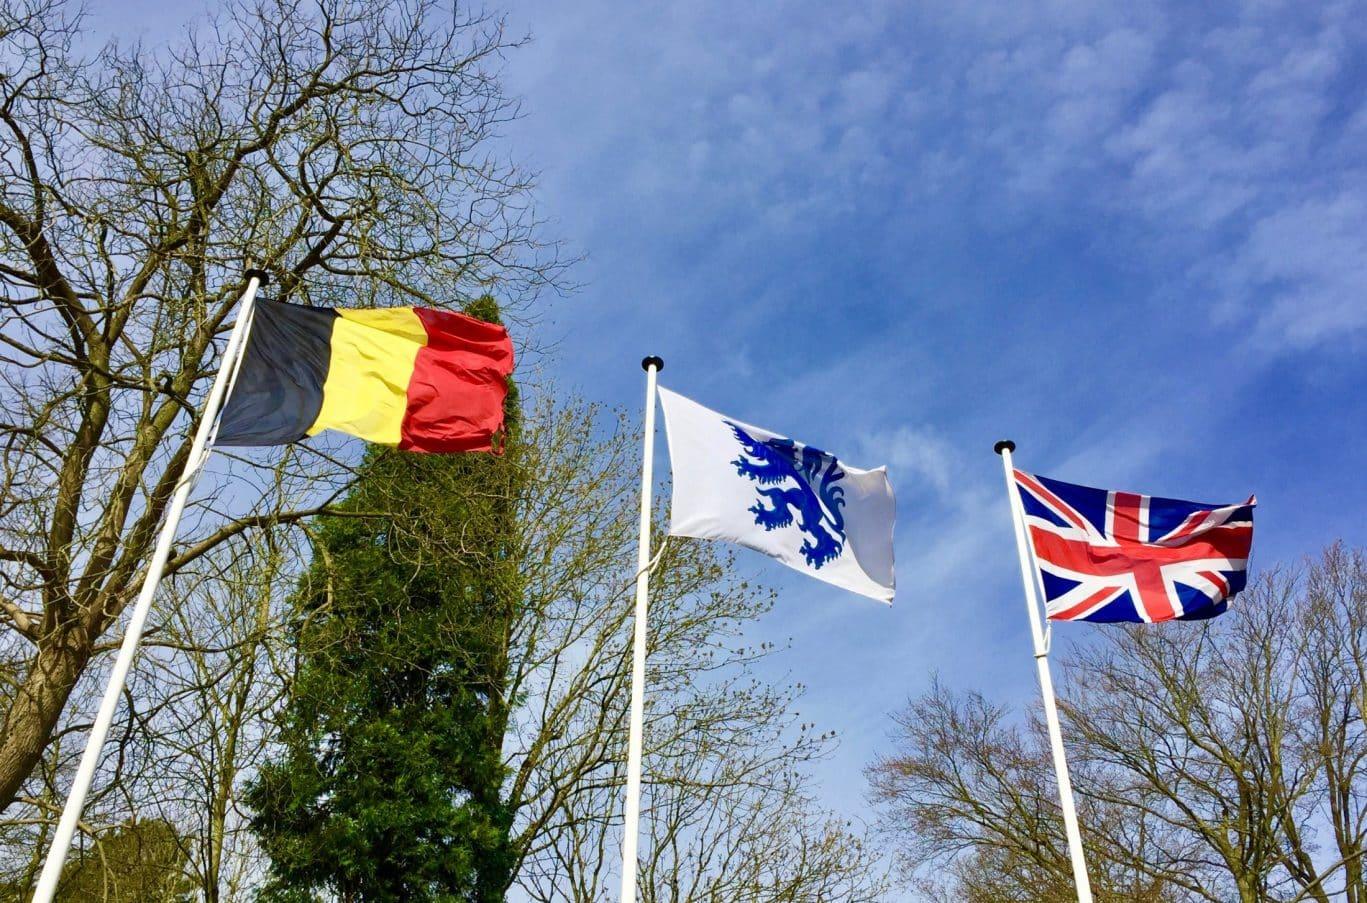 bsb-flags-april-2017